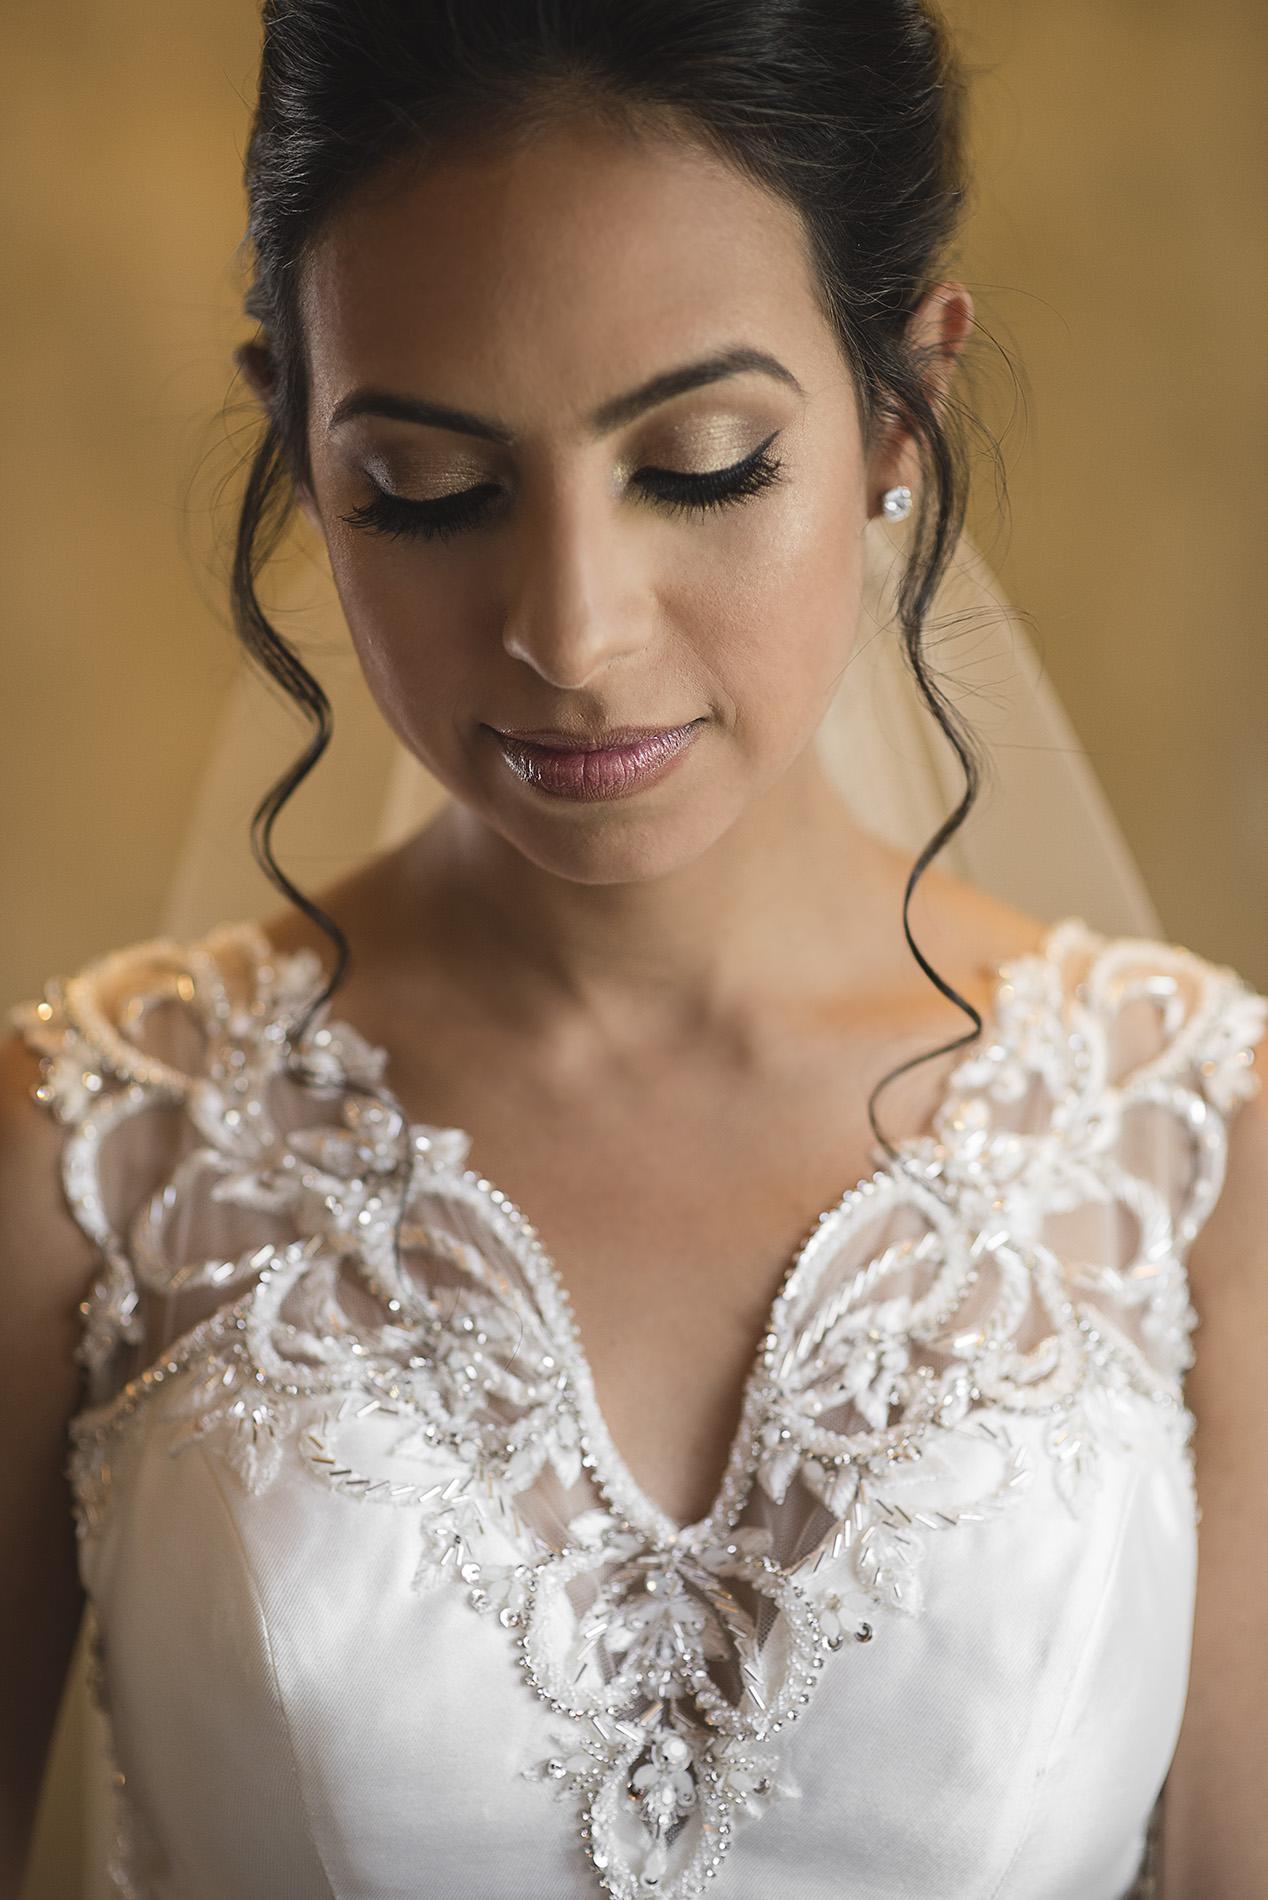 Houston-venue-Olde-Dobbin-Station-Romantic-Classic-Wedding-Photographer-024.jpg